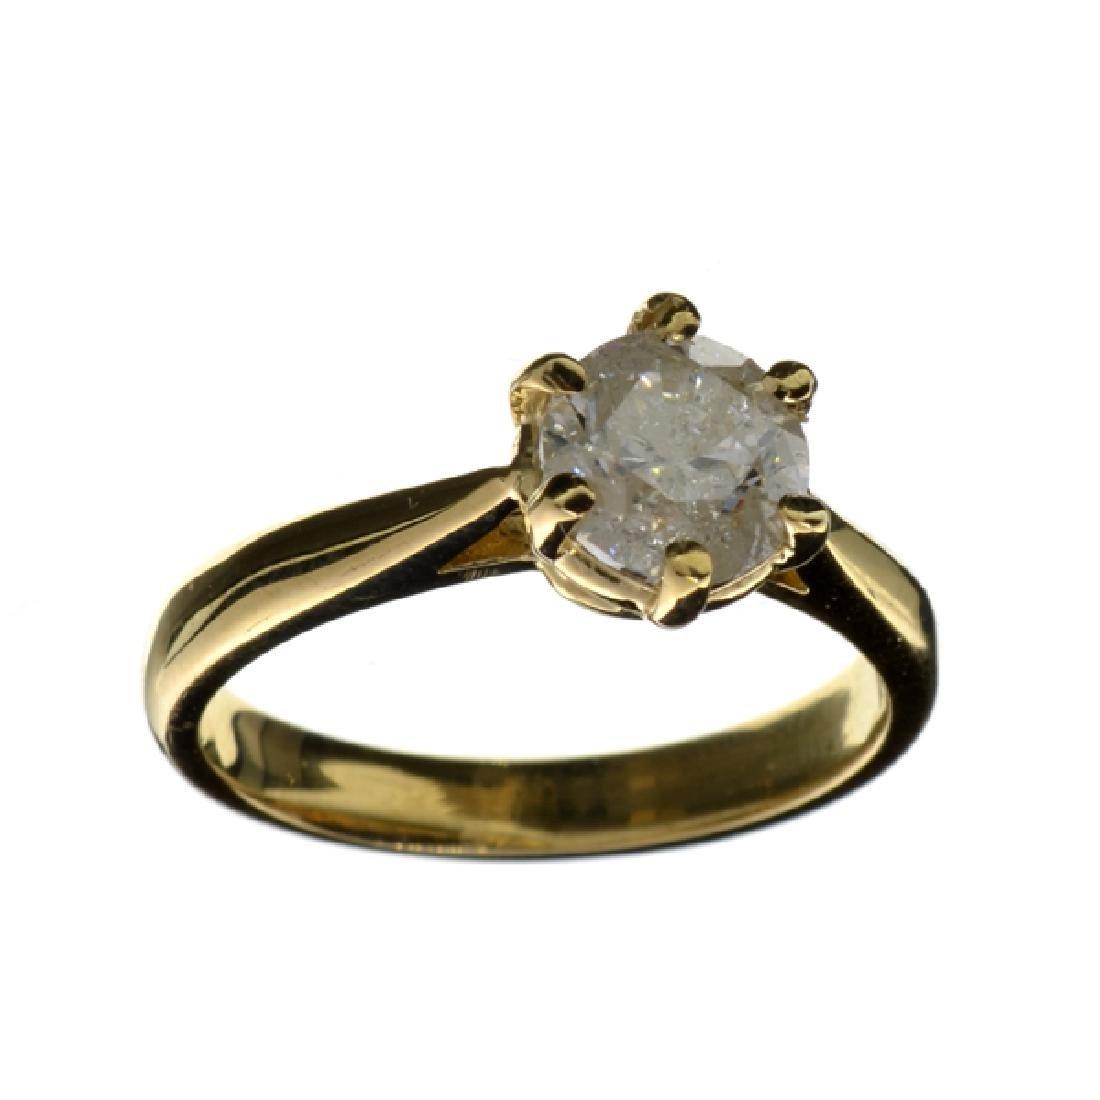 APP: 6.6k 14 kt. Gold, 1.13CT Round Cut Diamond Ring